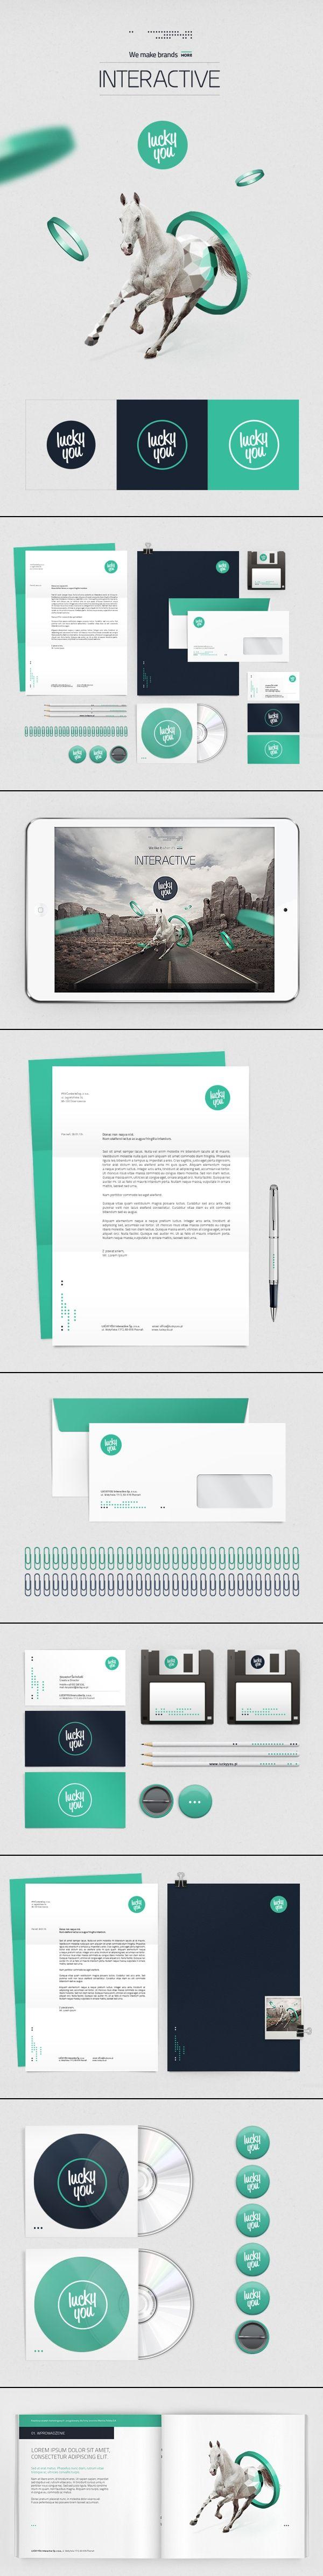 LUCKYYOU | #stationary #corporate #design #corporatedesign #identity #branding #marketing < repinned by www.BlickeDeeler.de | Take a look at www.LogoGestaltung-Hamburg.de